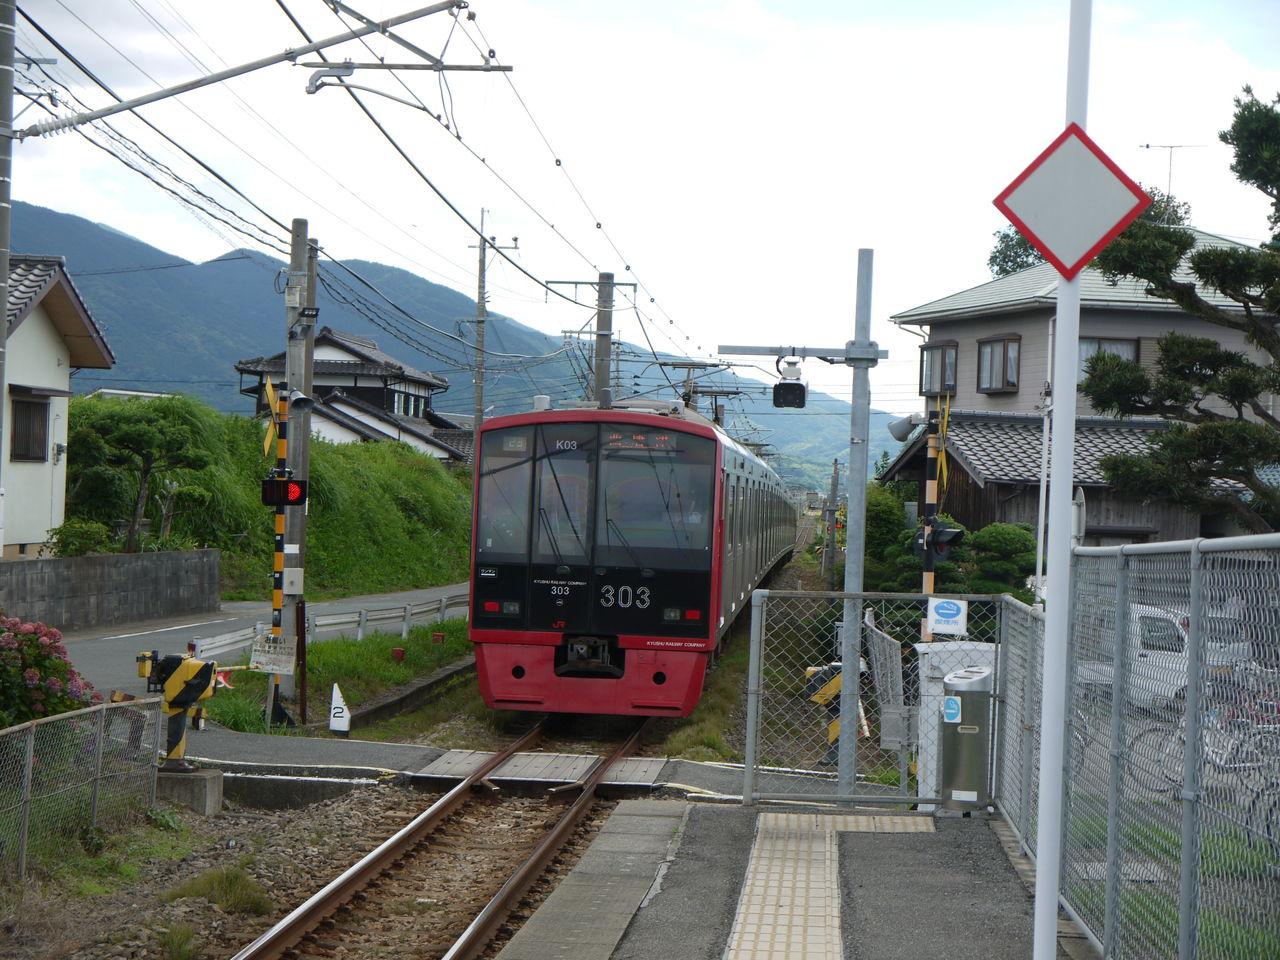 http://livedoor.blogimg.jp/shinkanaoka/imgs/4/a/4acf74af.jpg